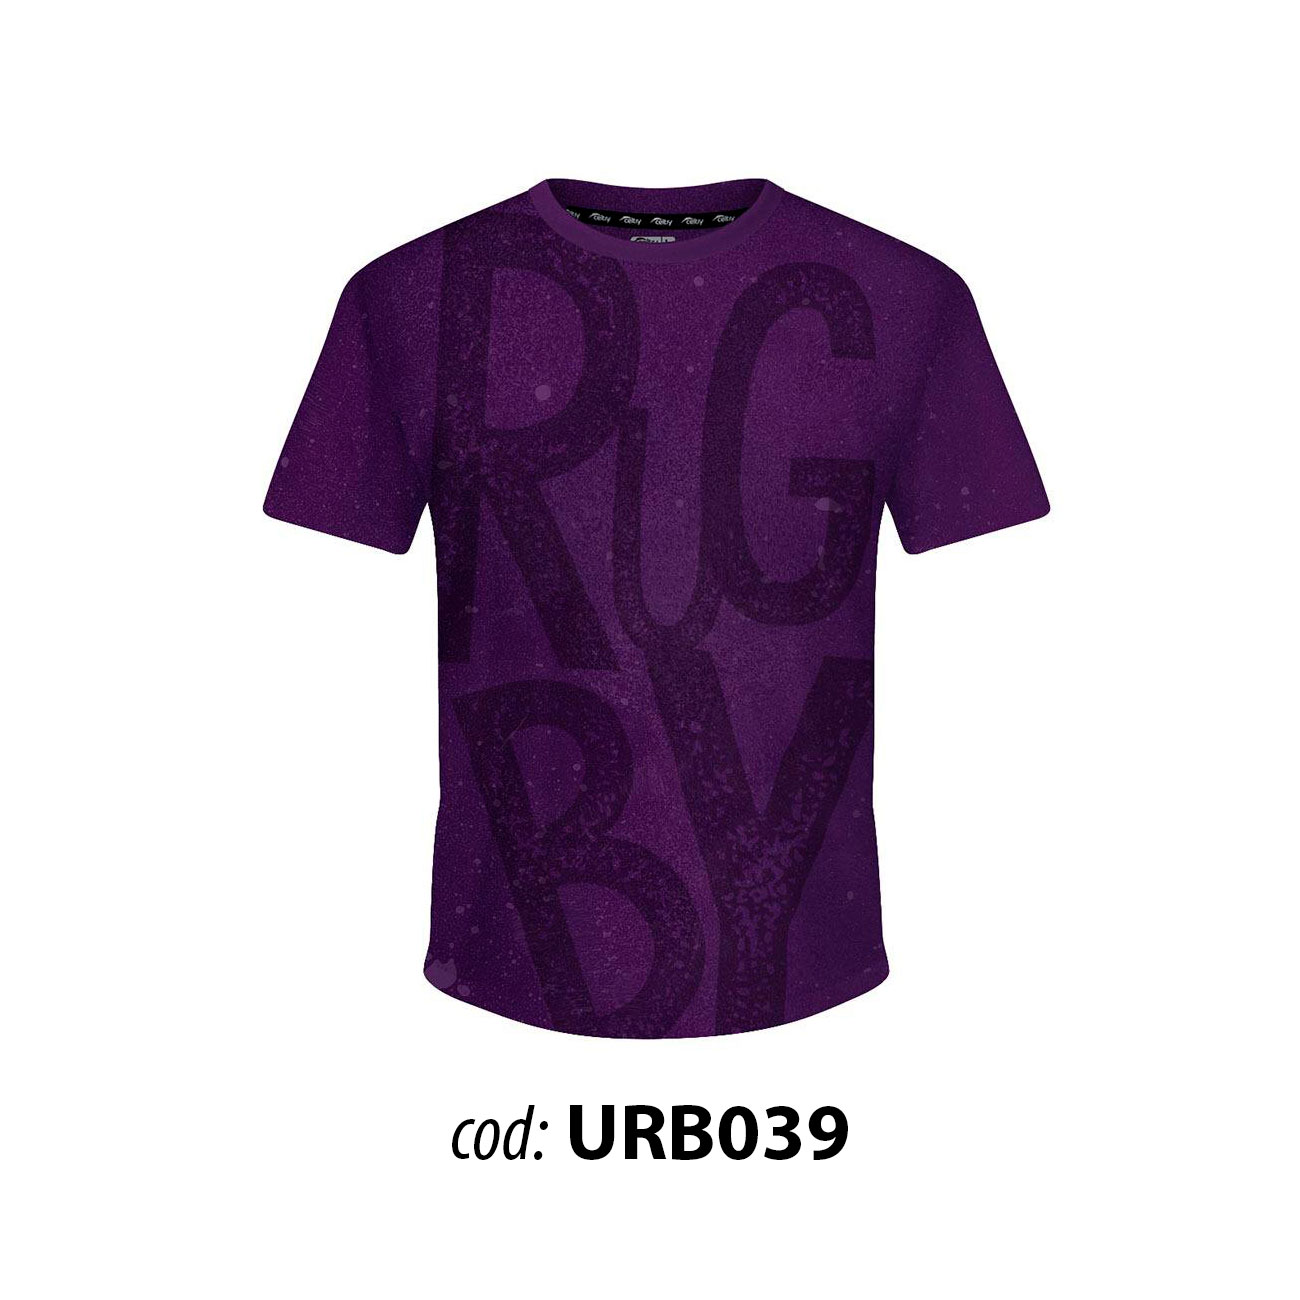 Polera polo | Urbana URB039